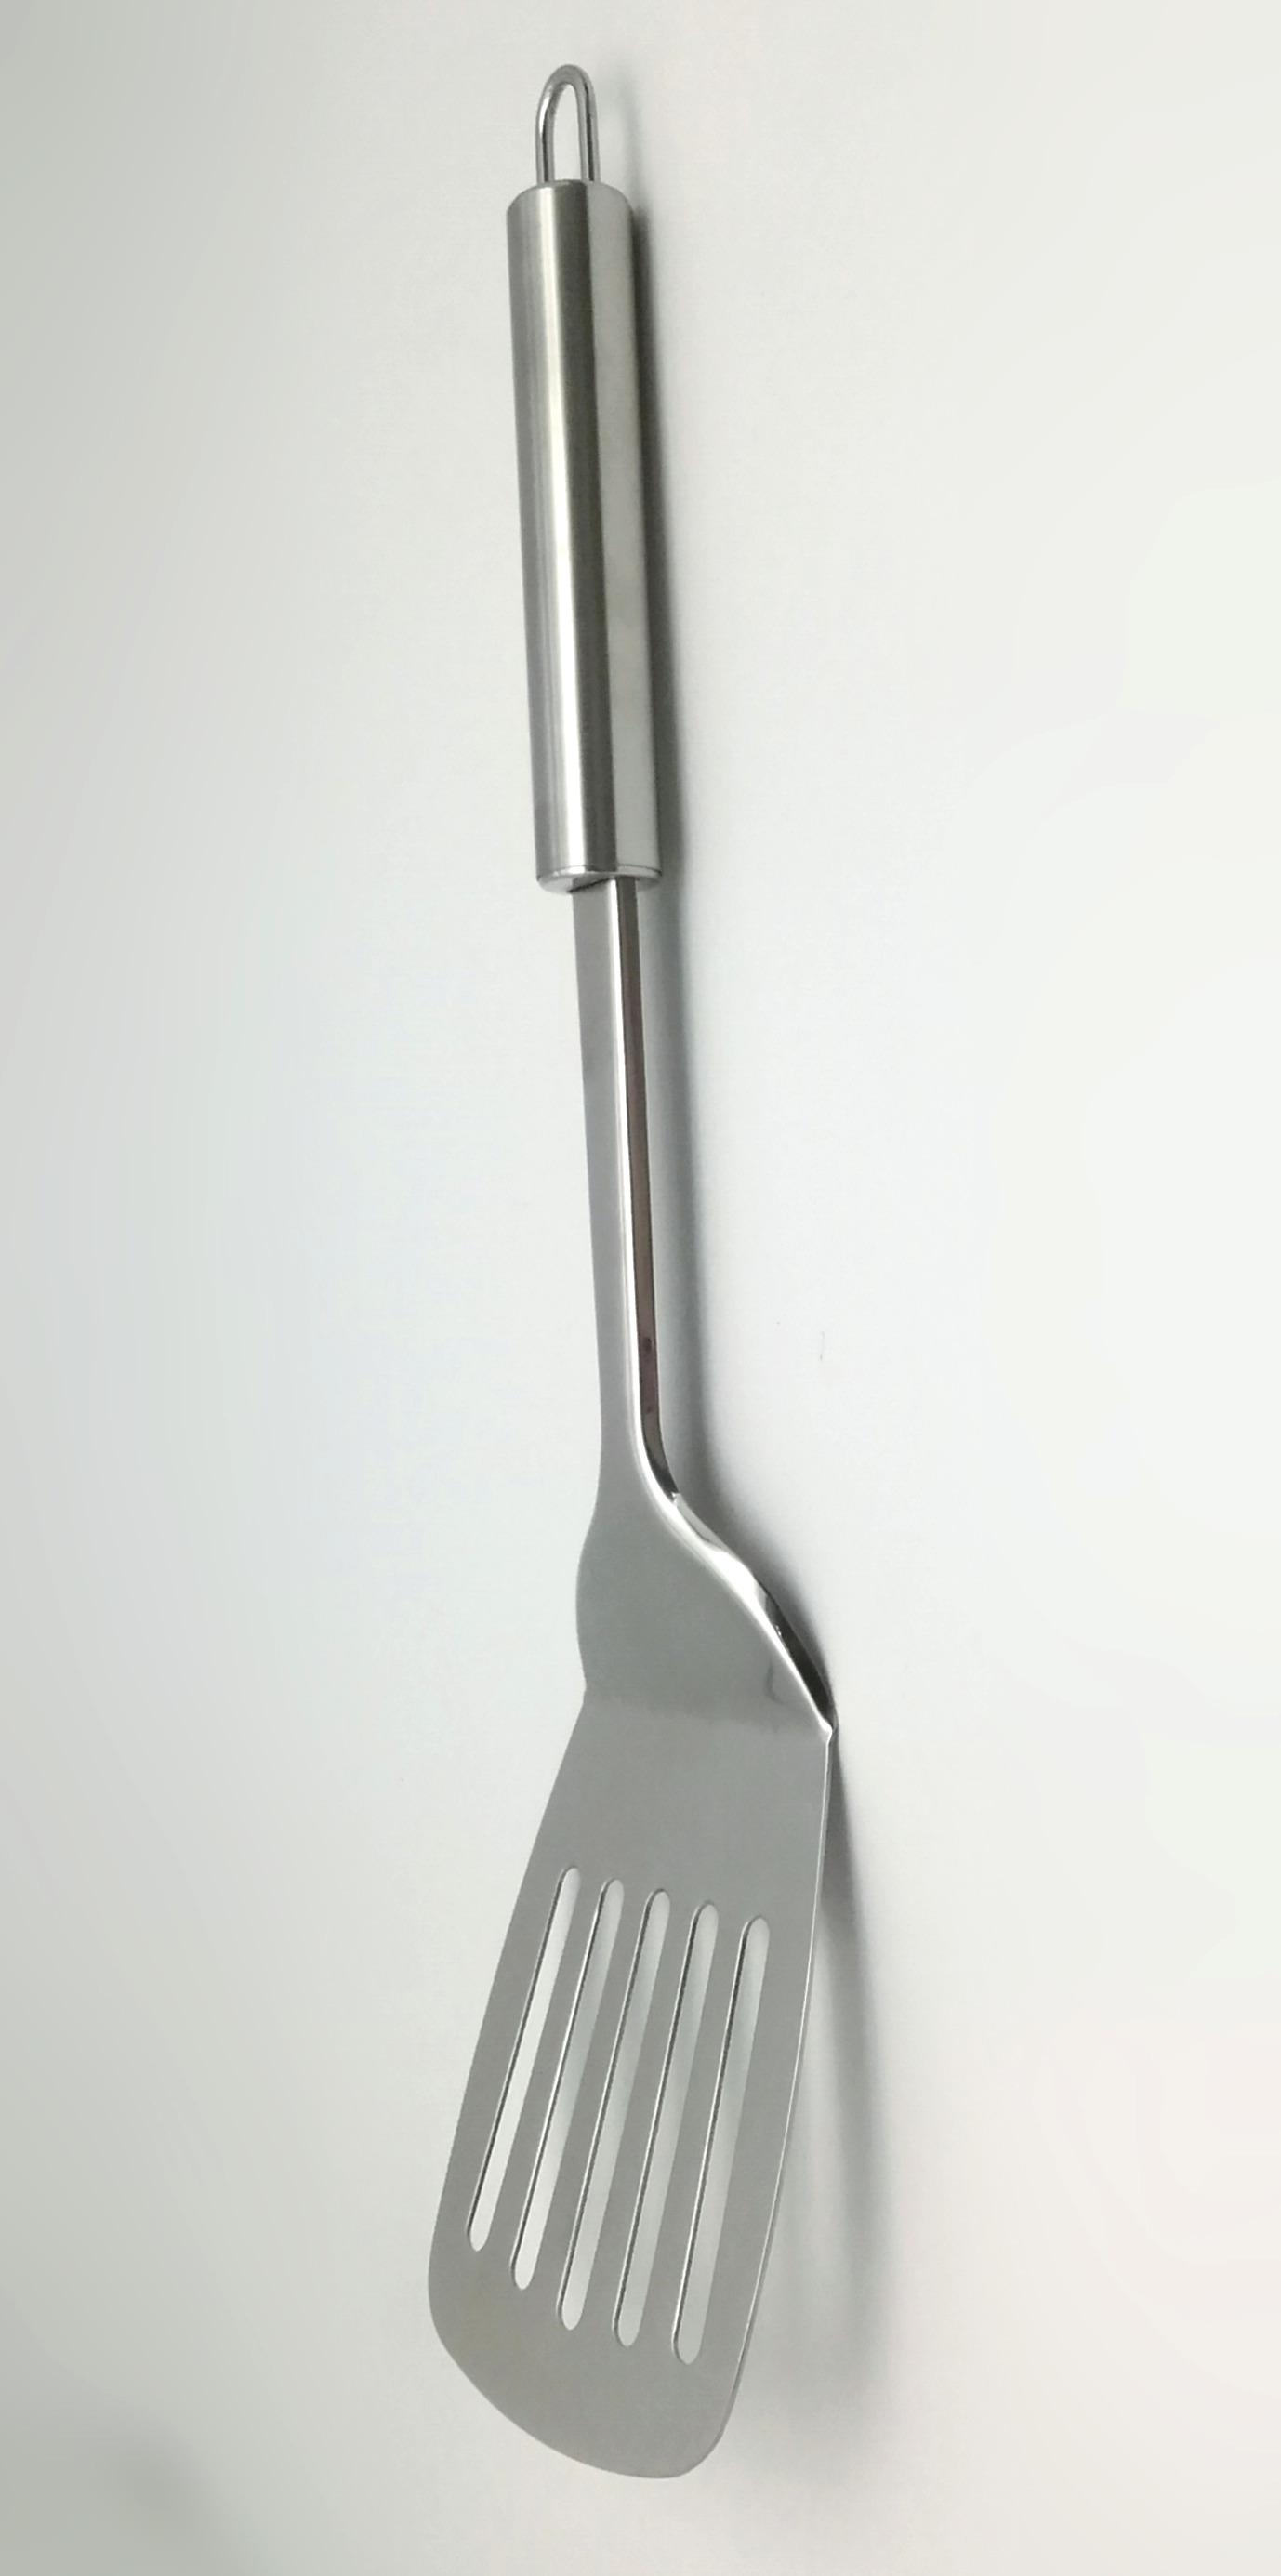 Stainless steel Turner